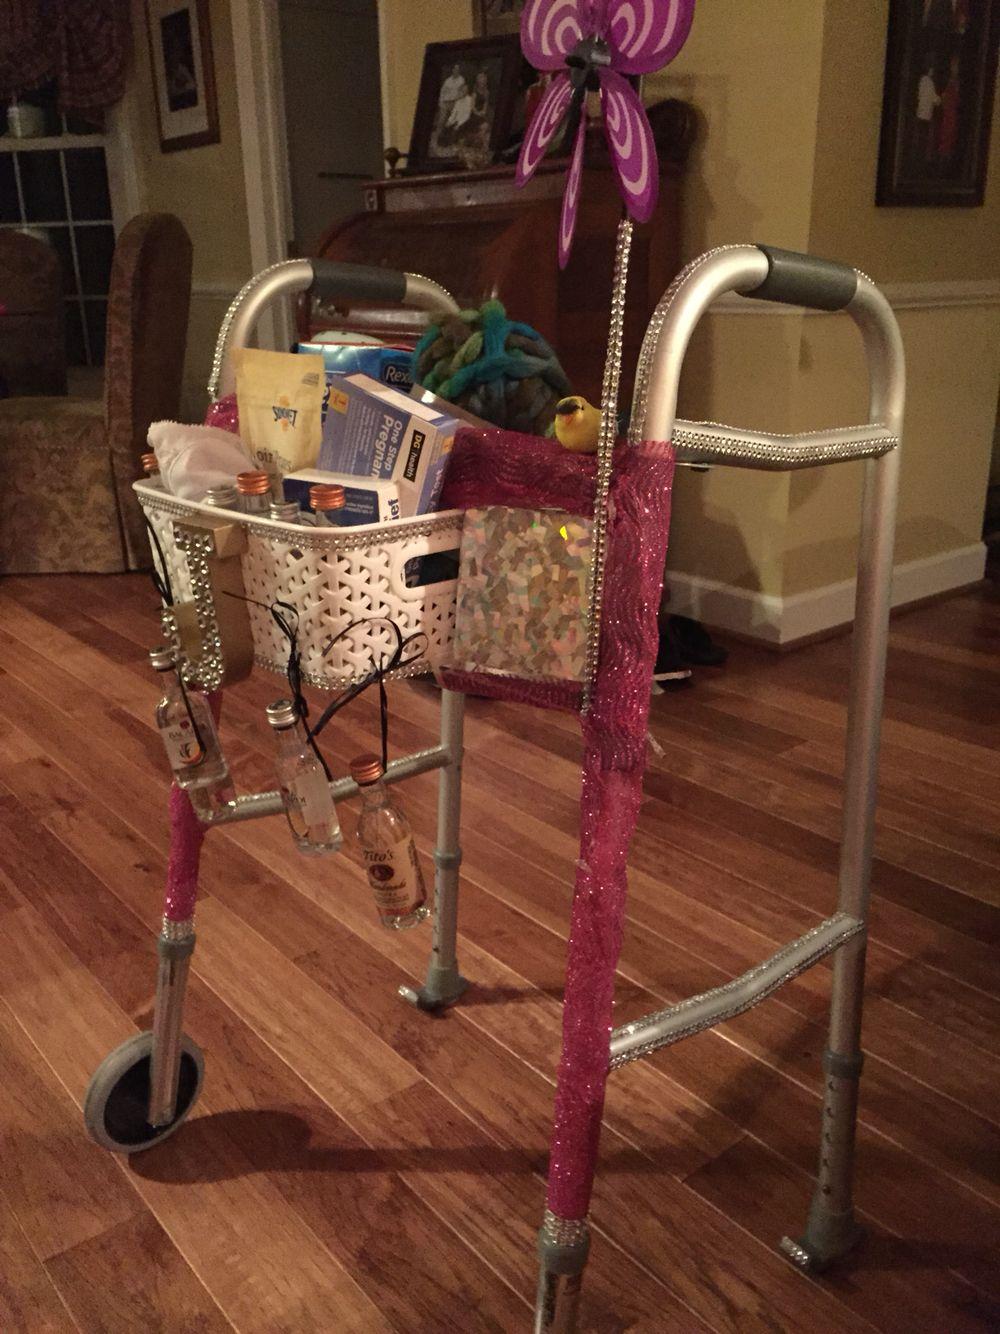 birthday walker over the hill diy birthday gift ideas. Black Bedroom Furniture Sets. Home Design Ideas